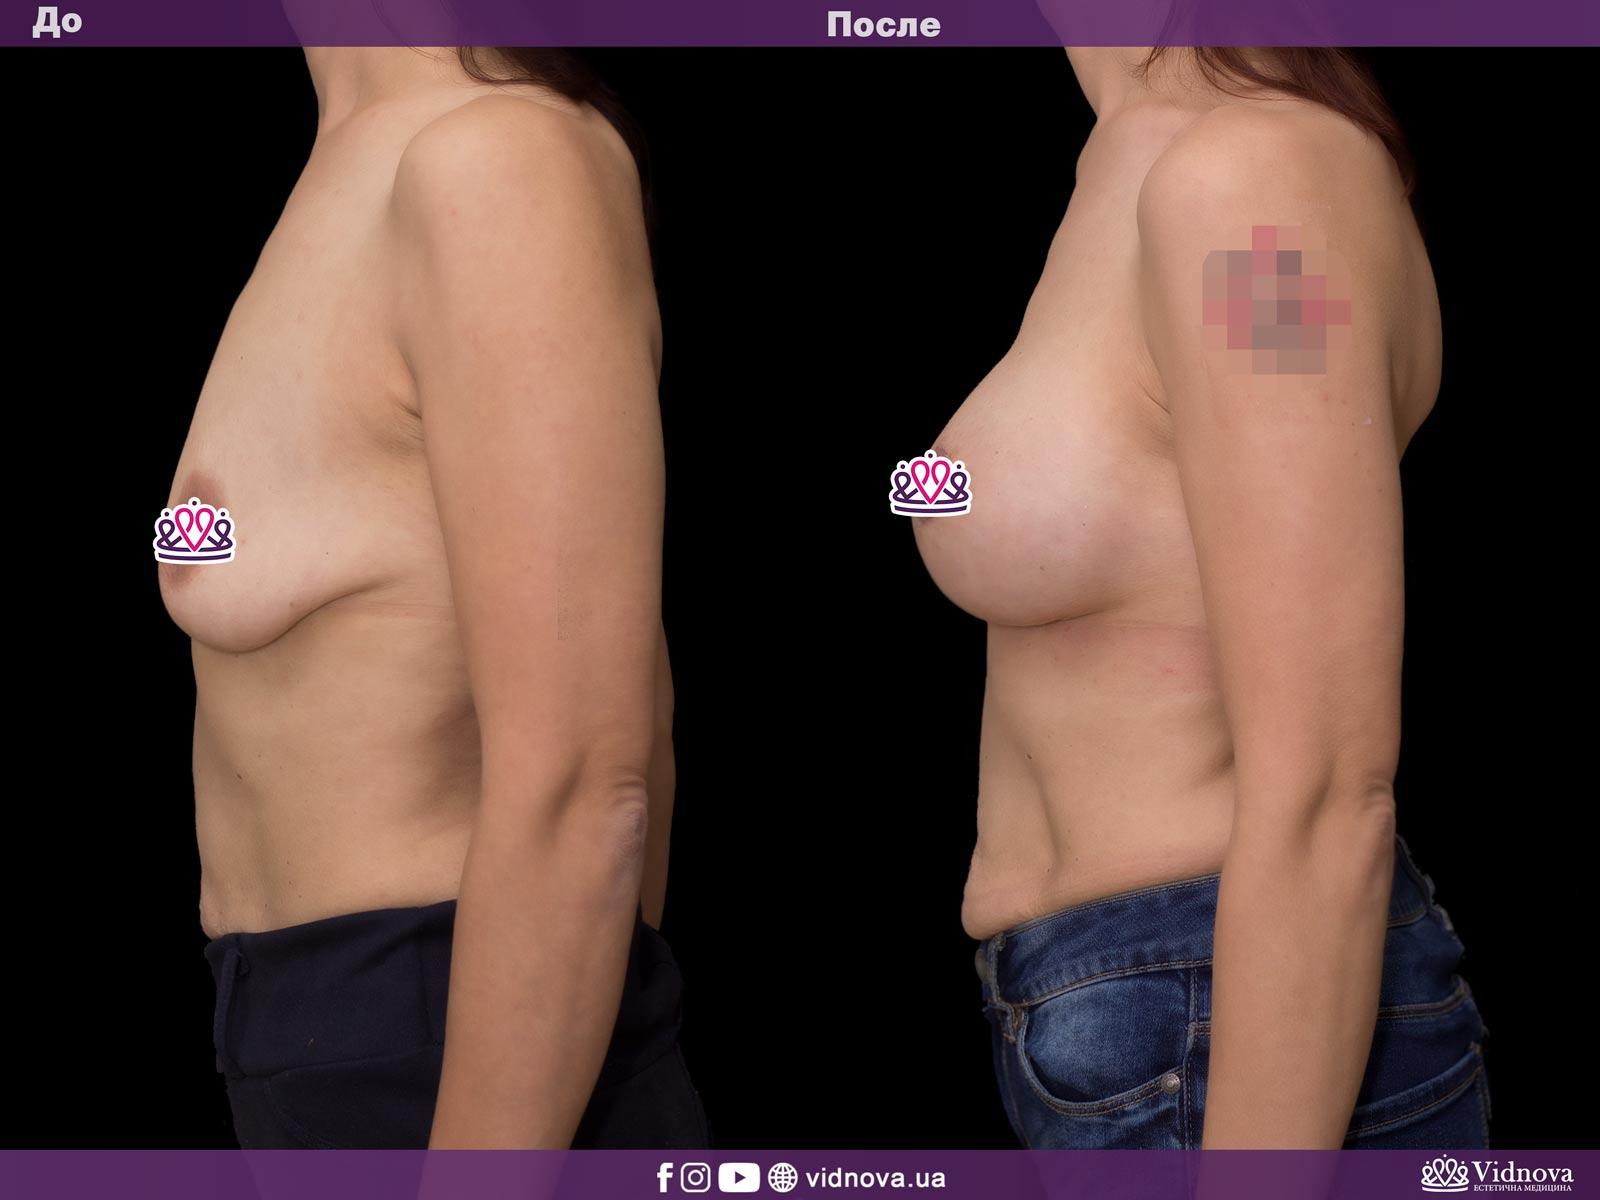 Подтяжка груди: Фото ДО и ПОСЛЕ - Пример №16-3 - Клиника Vidnova